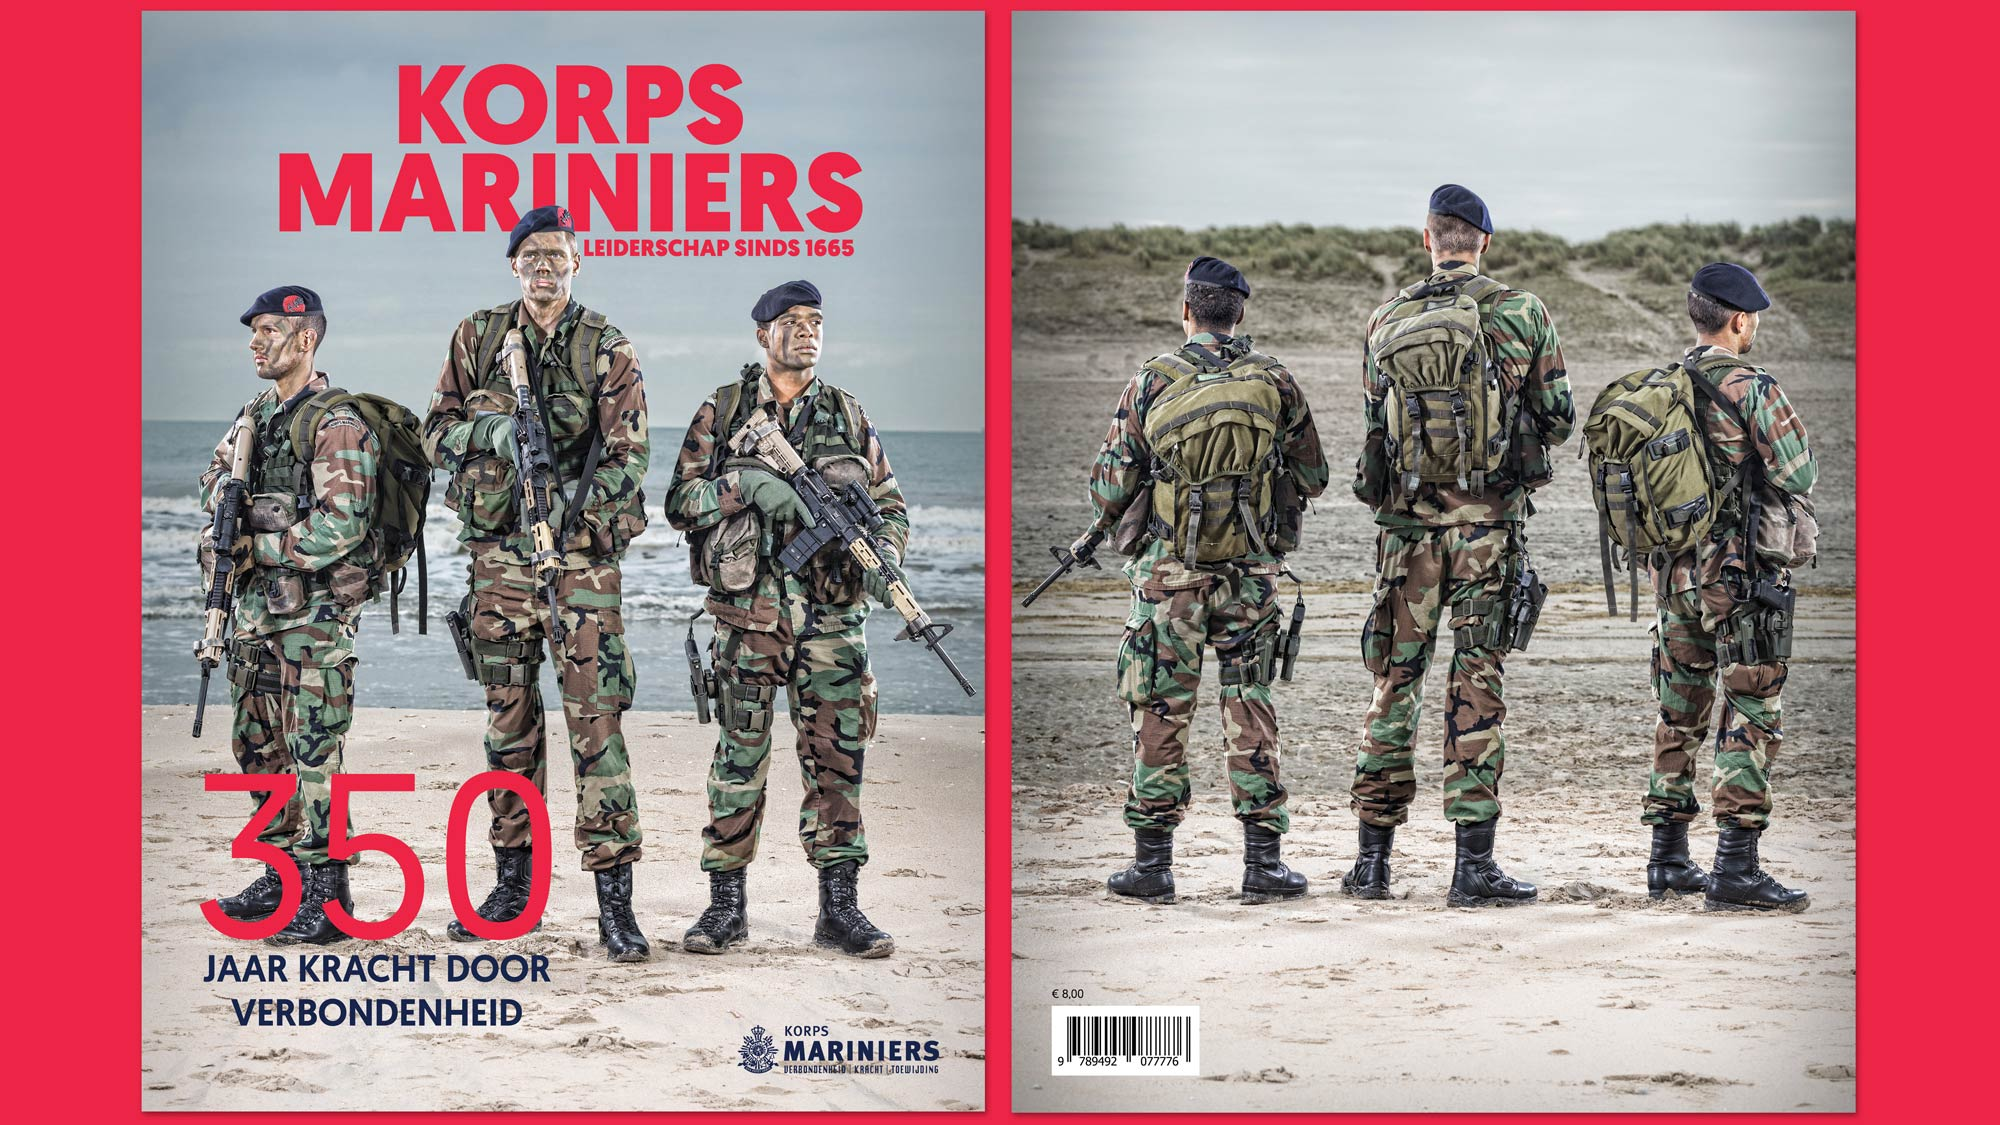 Korps Mariniers, Mixus studio